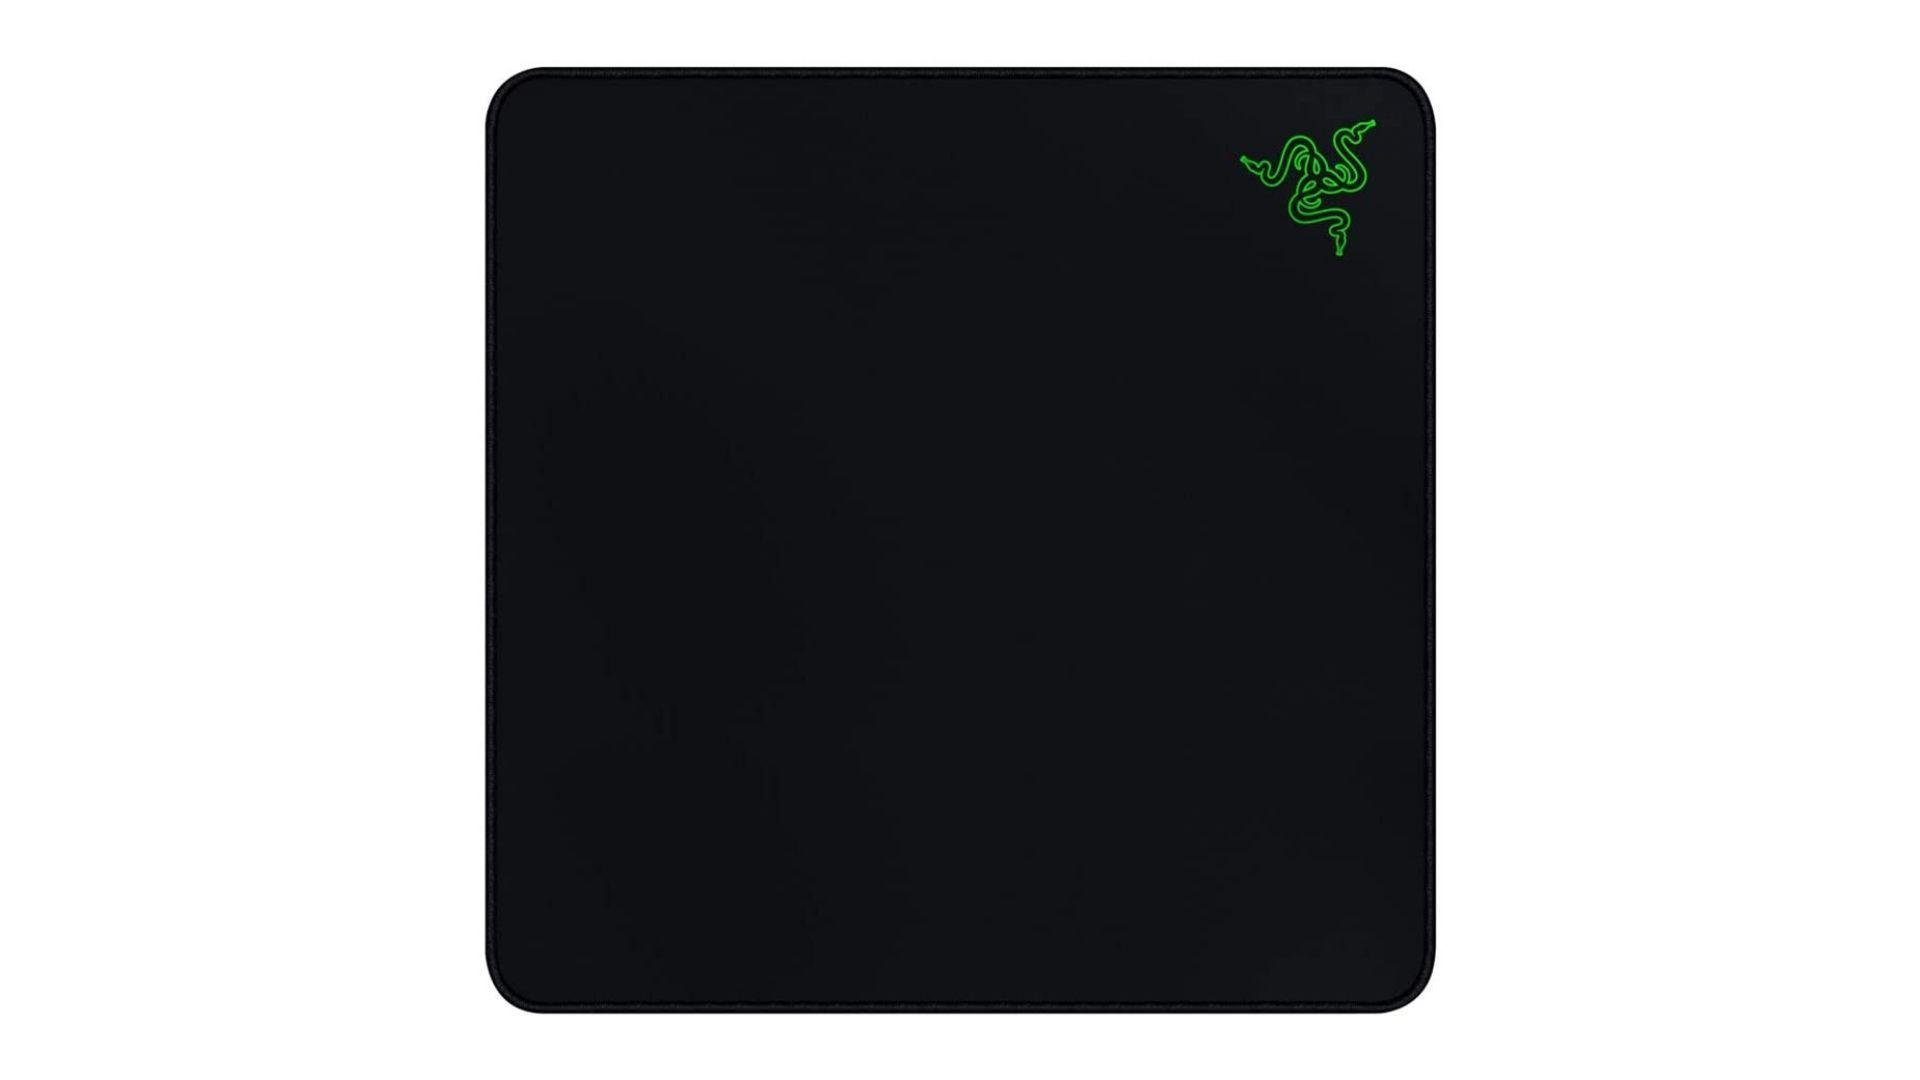 Razer Gigantus Elite preto com logo verde